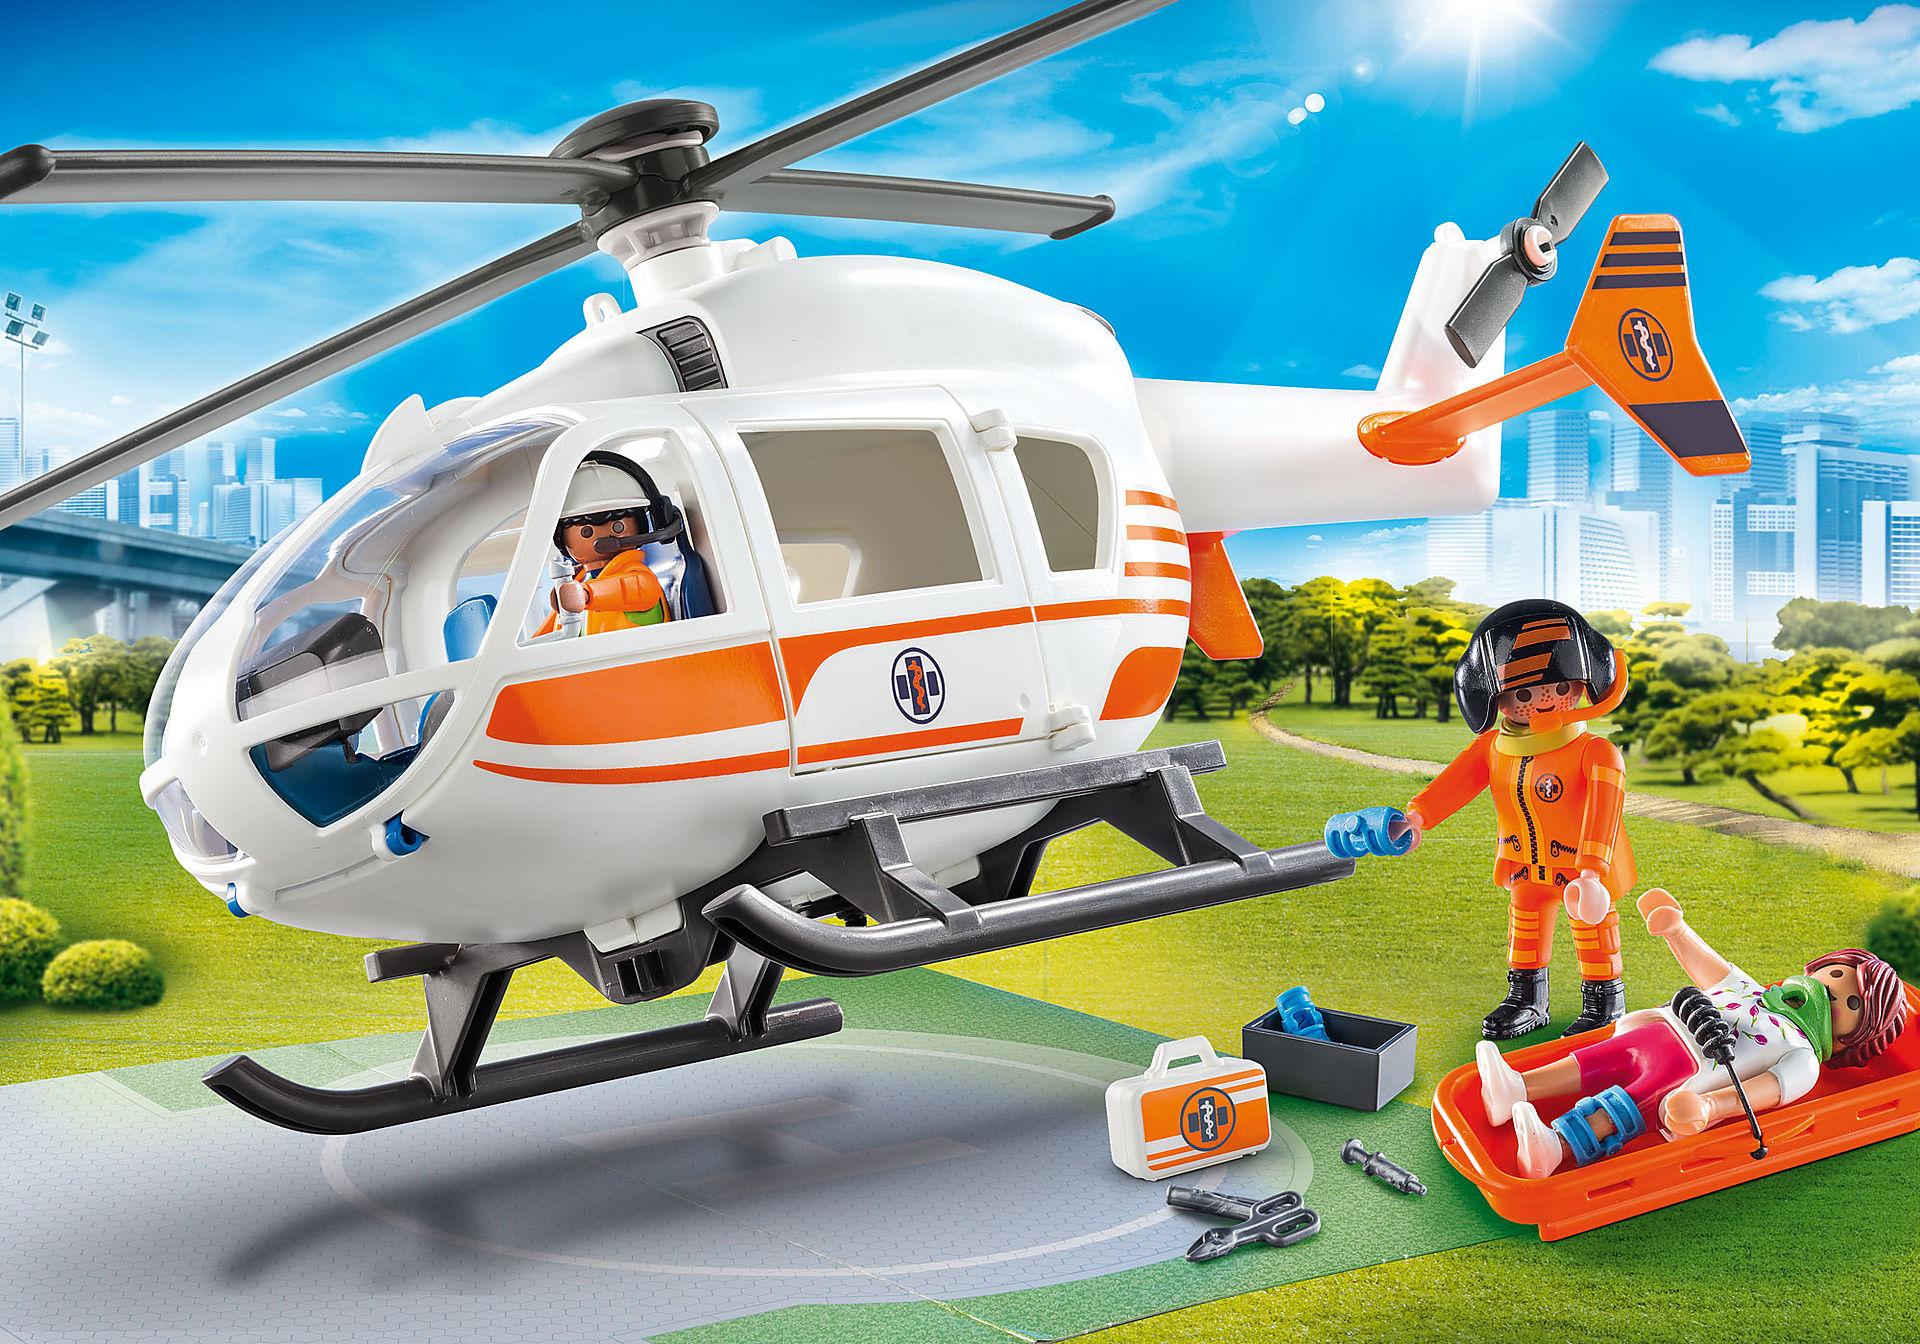 70048 Rettungshelikopter zoom image1